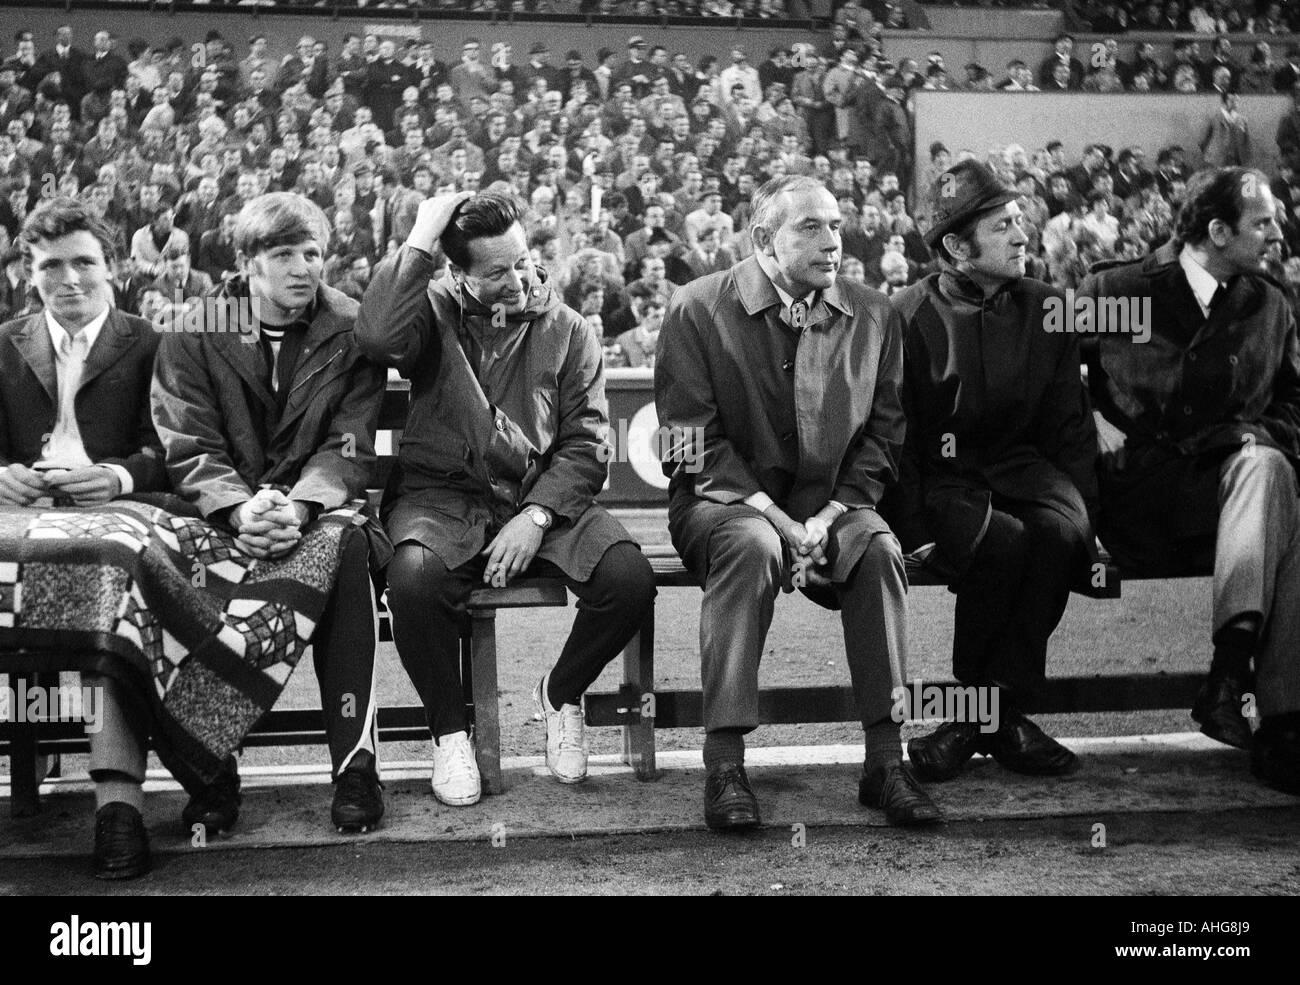 football, Bundesliga, 1969/1970, Rot-Weiss Oberhausen versus Borussia Moenchengladbach 3:4, Niederrhein Stadium in Oberhausen, Gladbach had achieved the German football league championship 1970 before this match already, it was the first championship of B - Stock Image